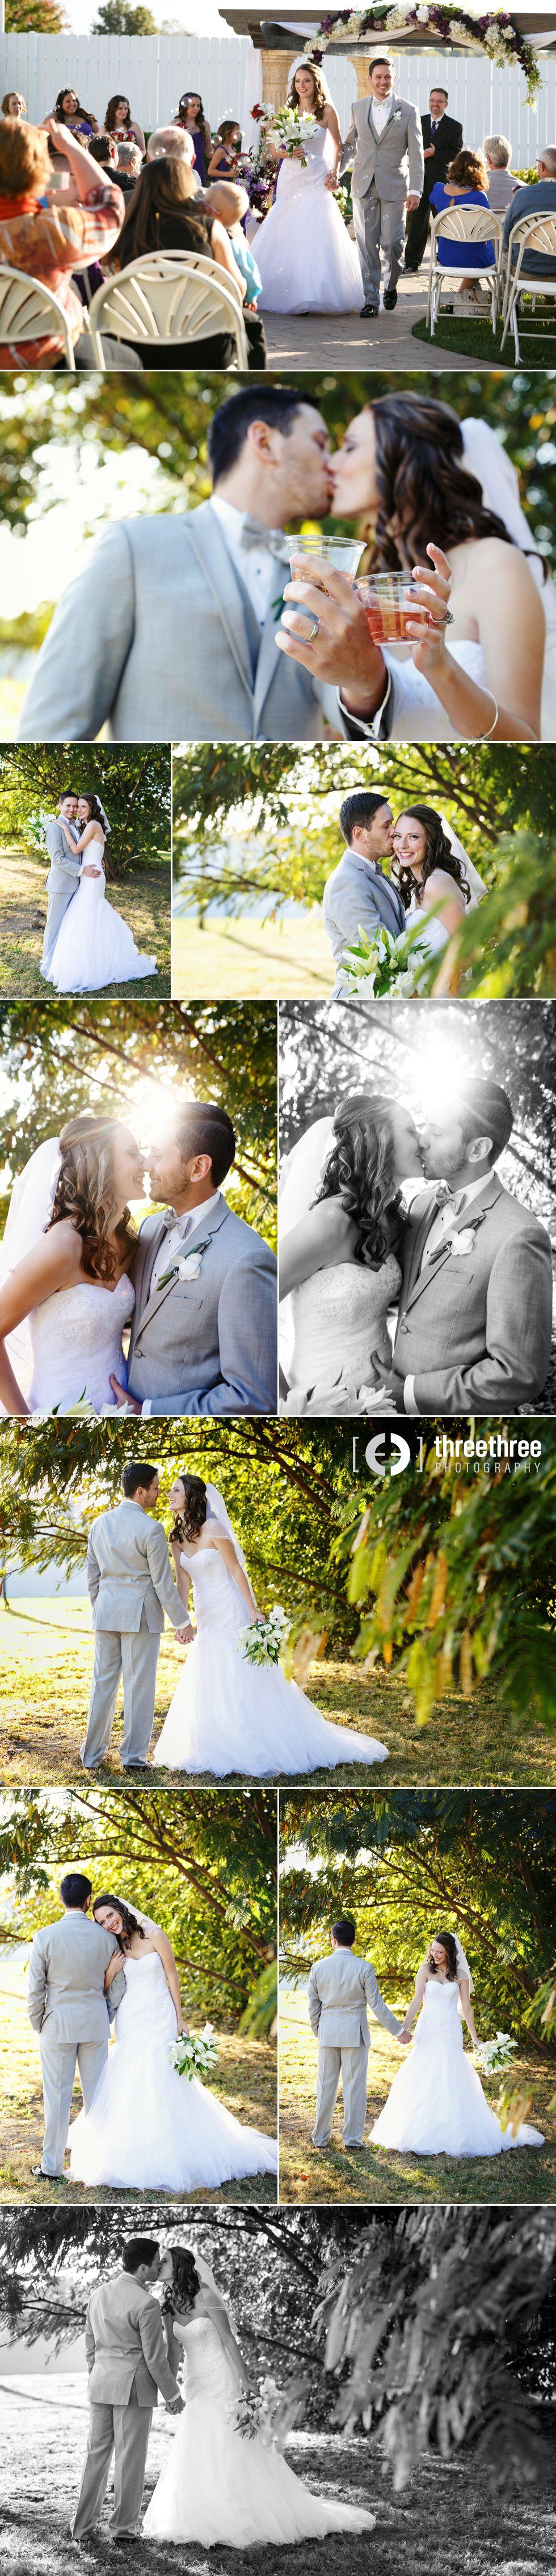 Kristin_Dustin_Wedding Blog 10